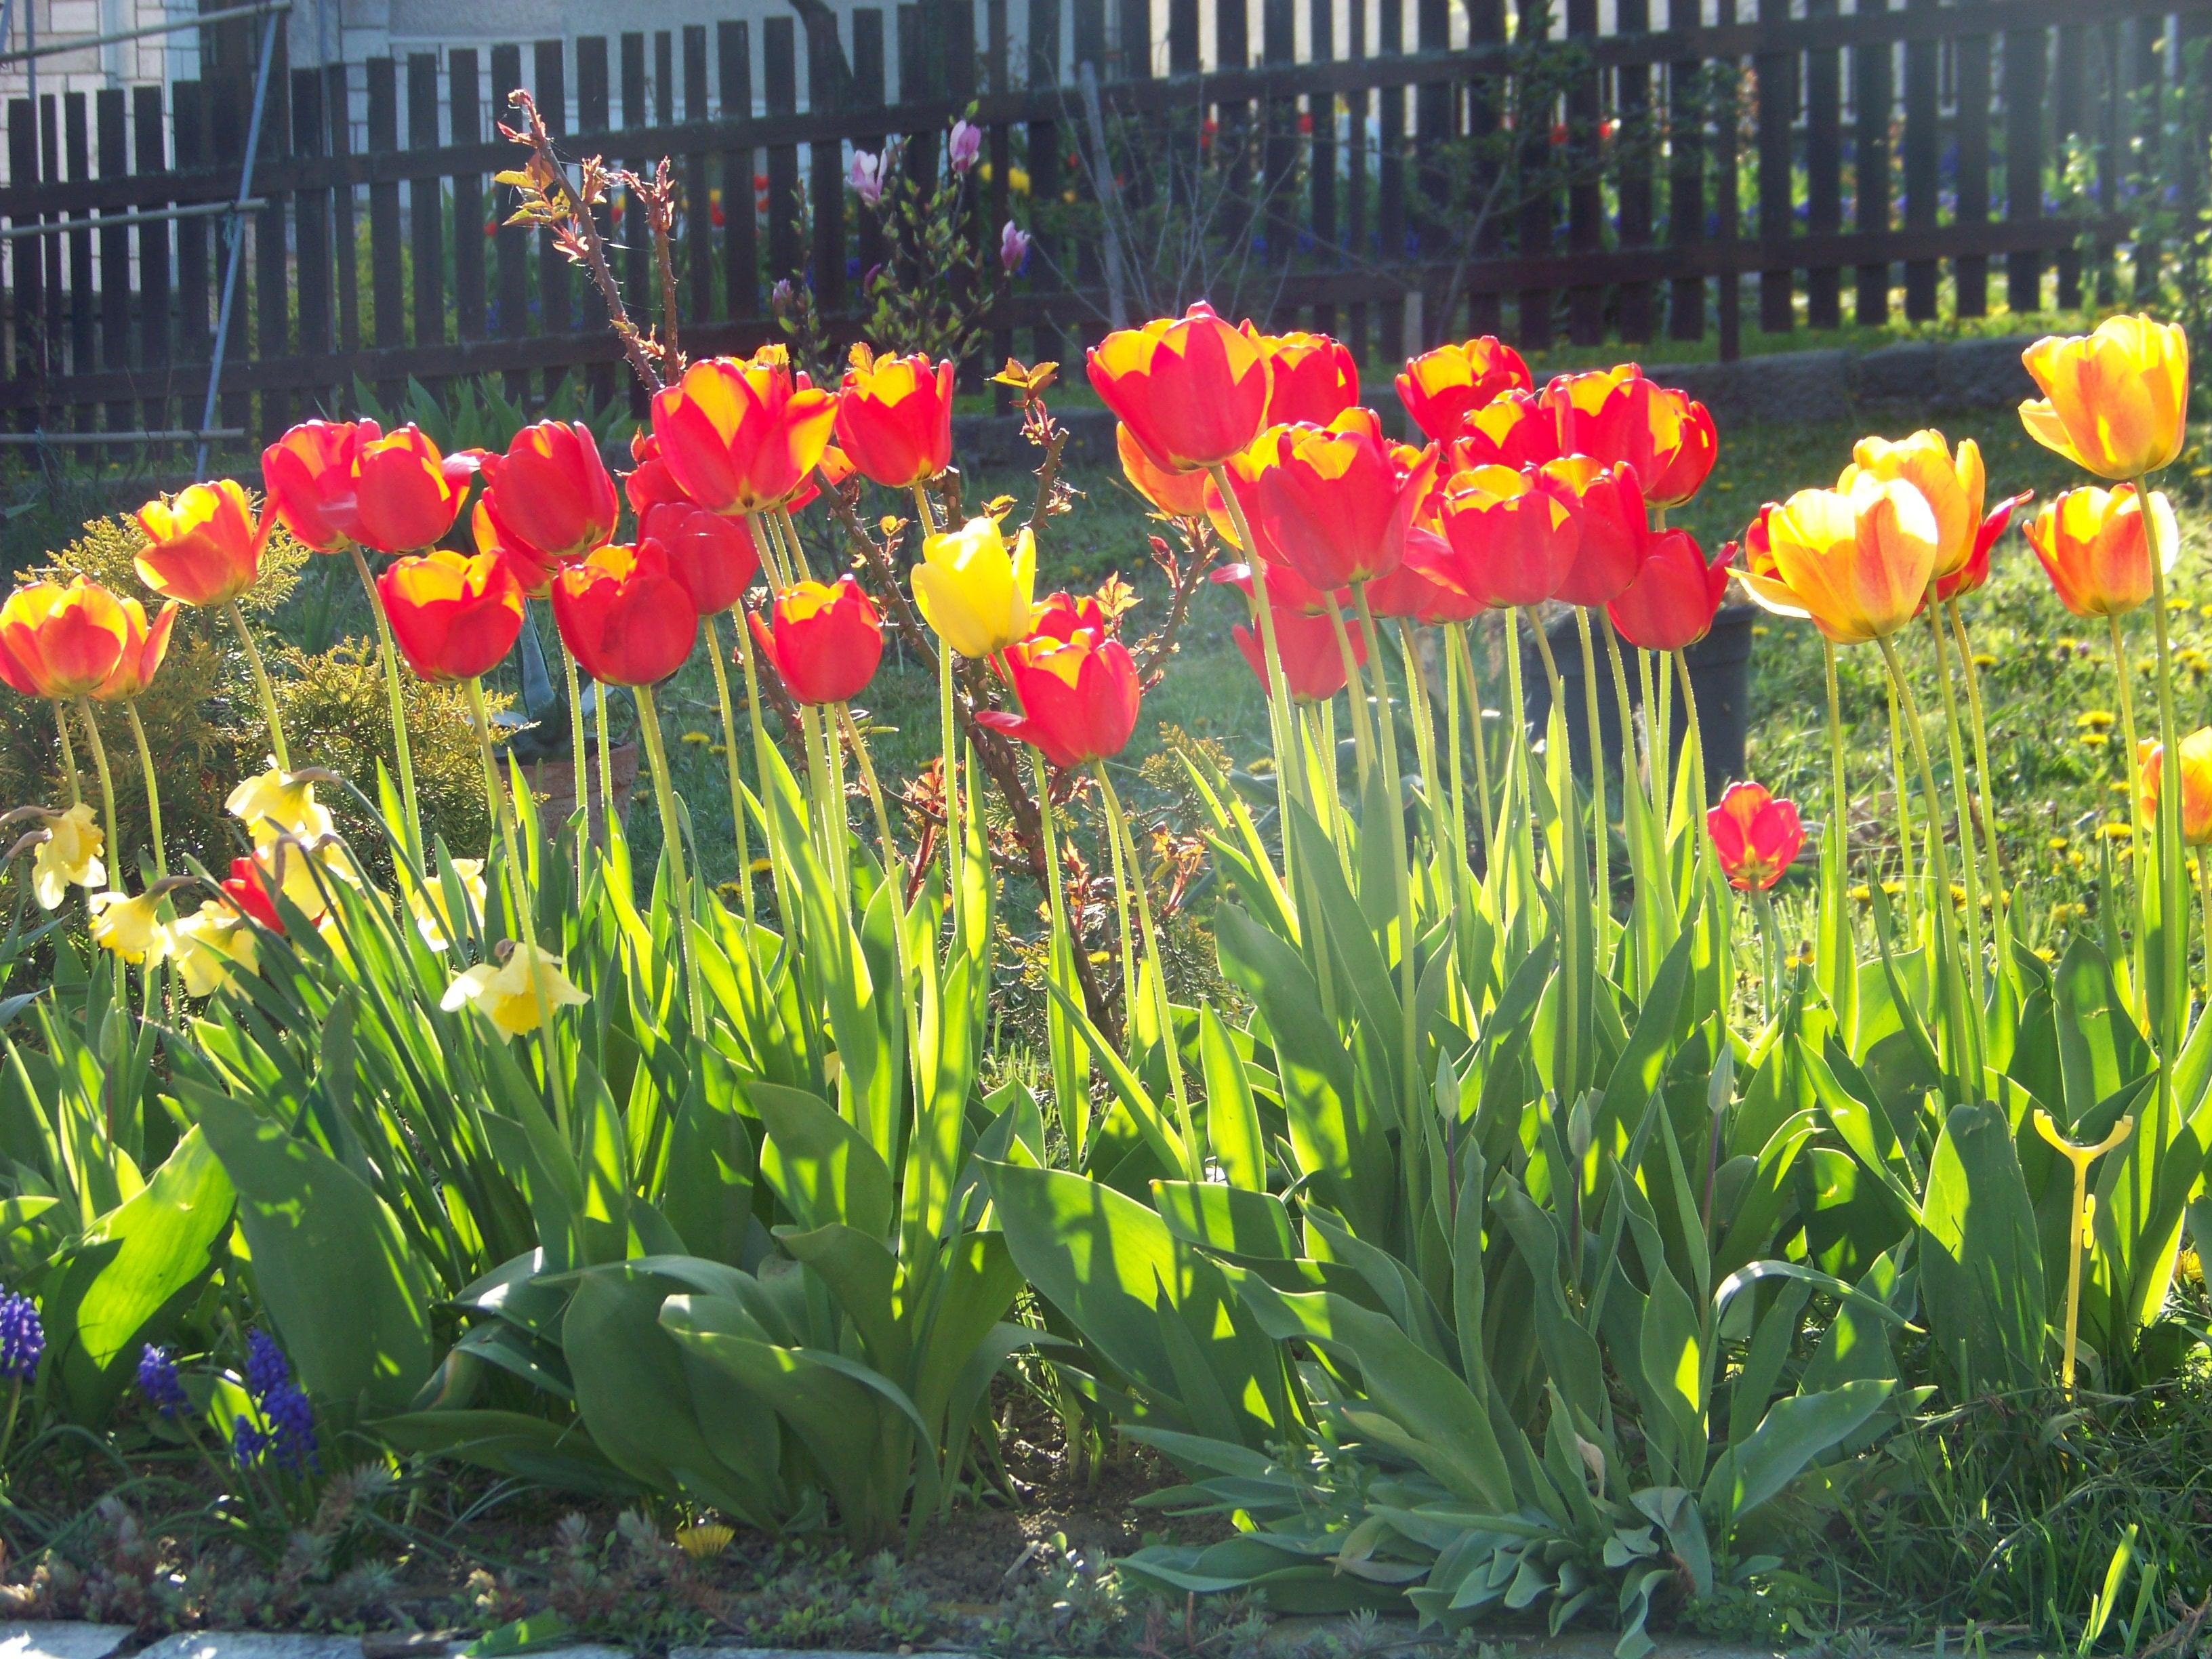 File Tulips in a flower bed JPG